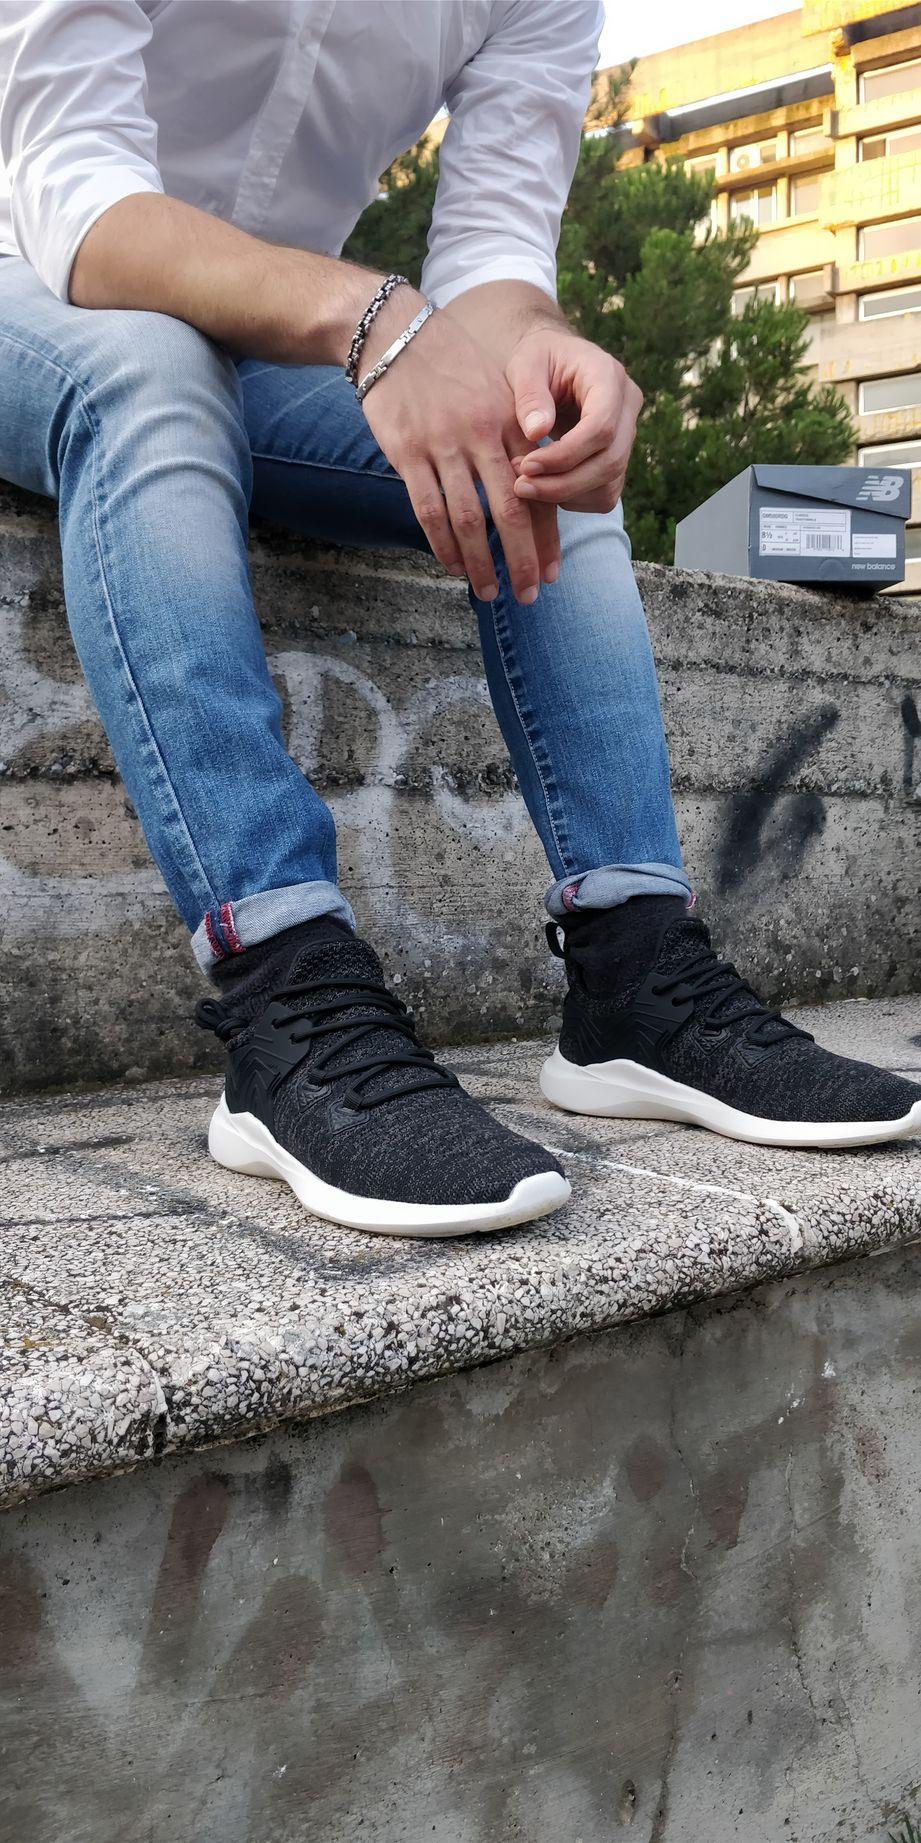 Joma-Scarpe-sportive-Sneakers-Lifestyle-sportswear-Nero-JCSM-mesh miniatura 5